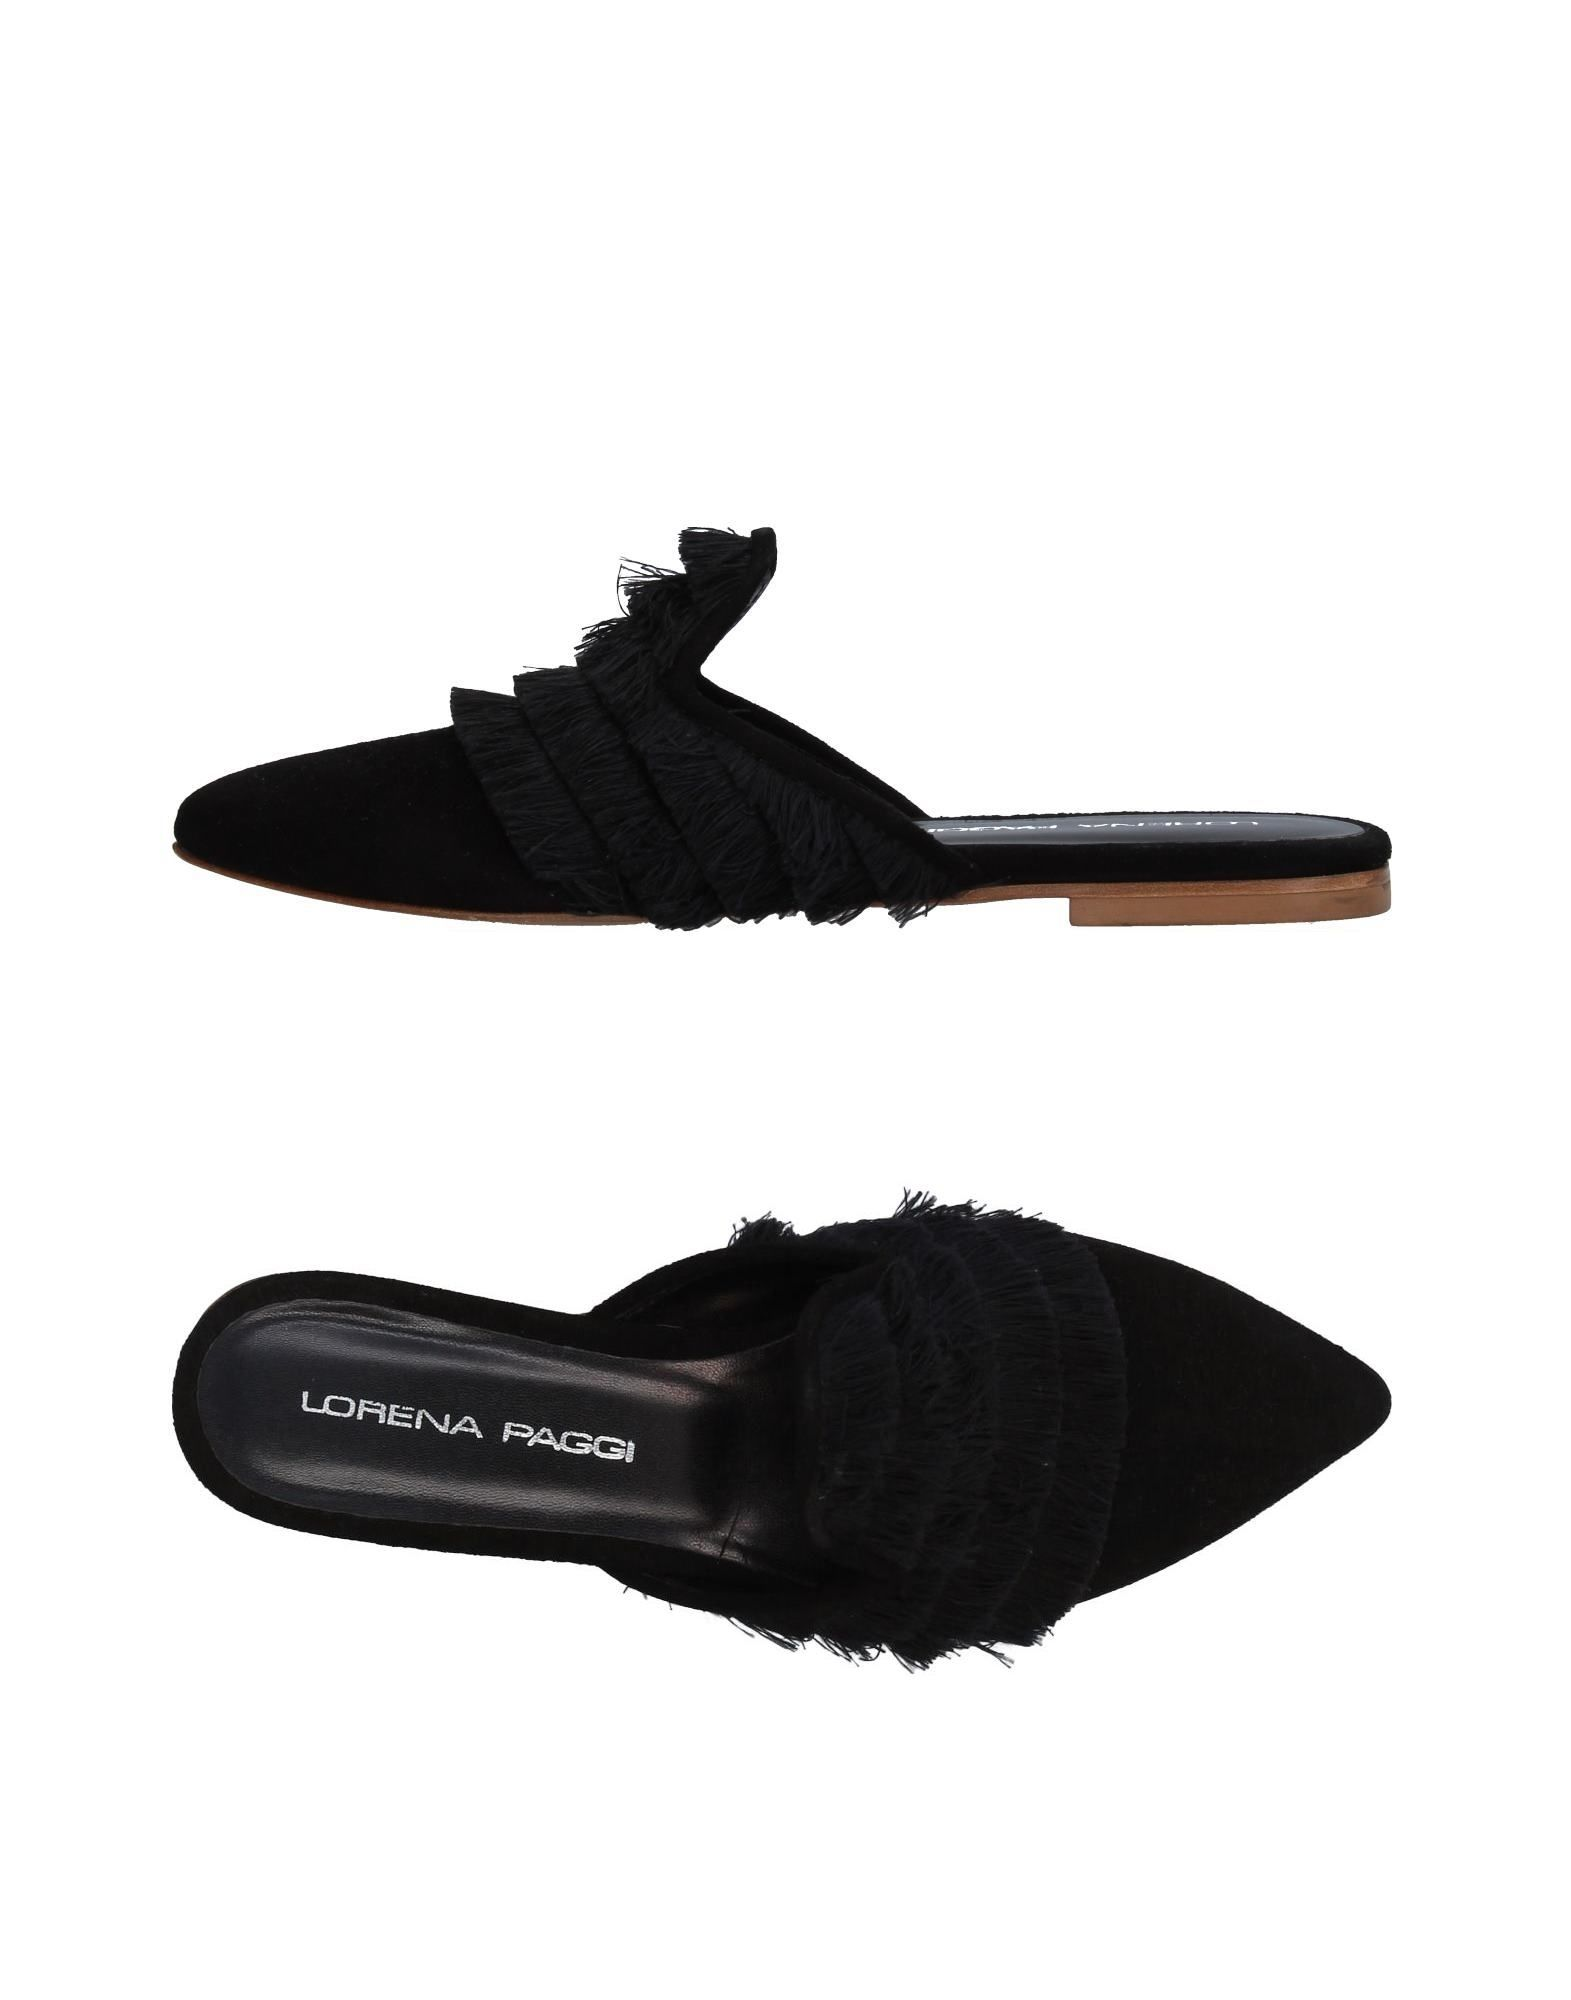 Lorena Paggi Pantoletten Damen  11376196KN Gute Qualität beliebte Schuhe